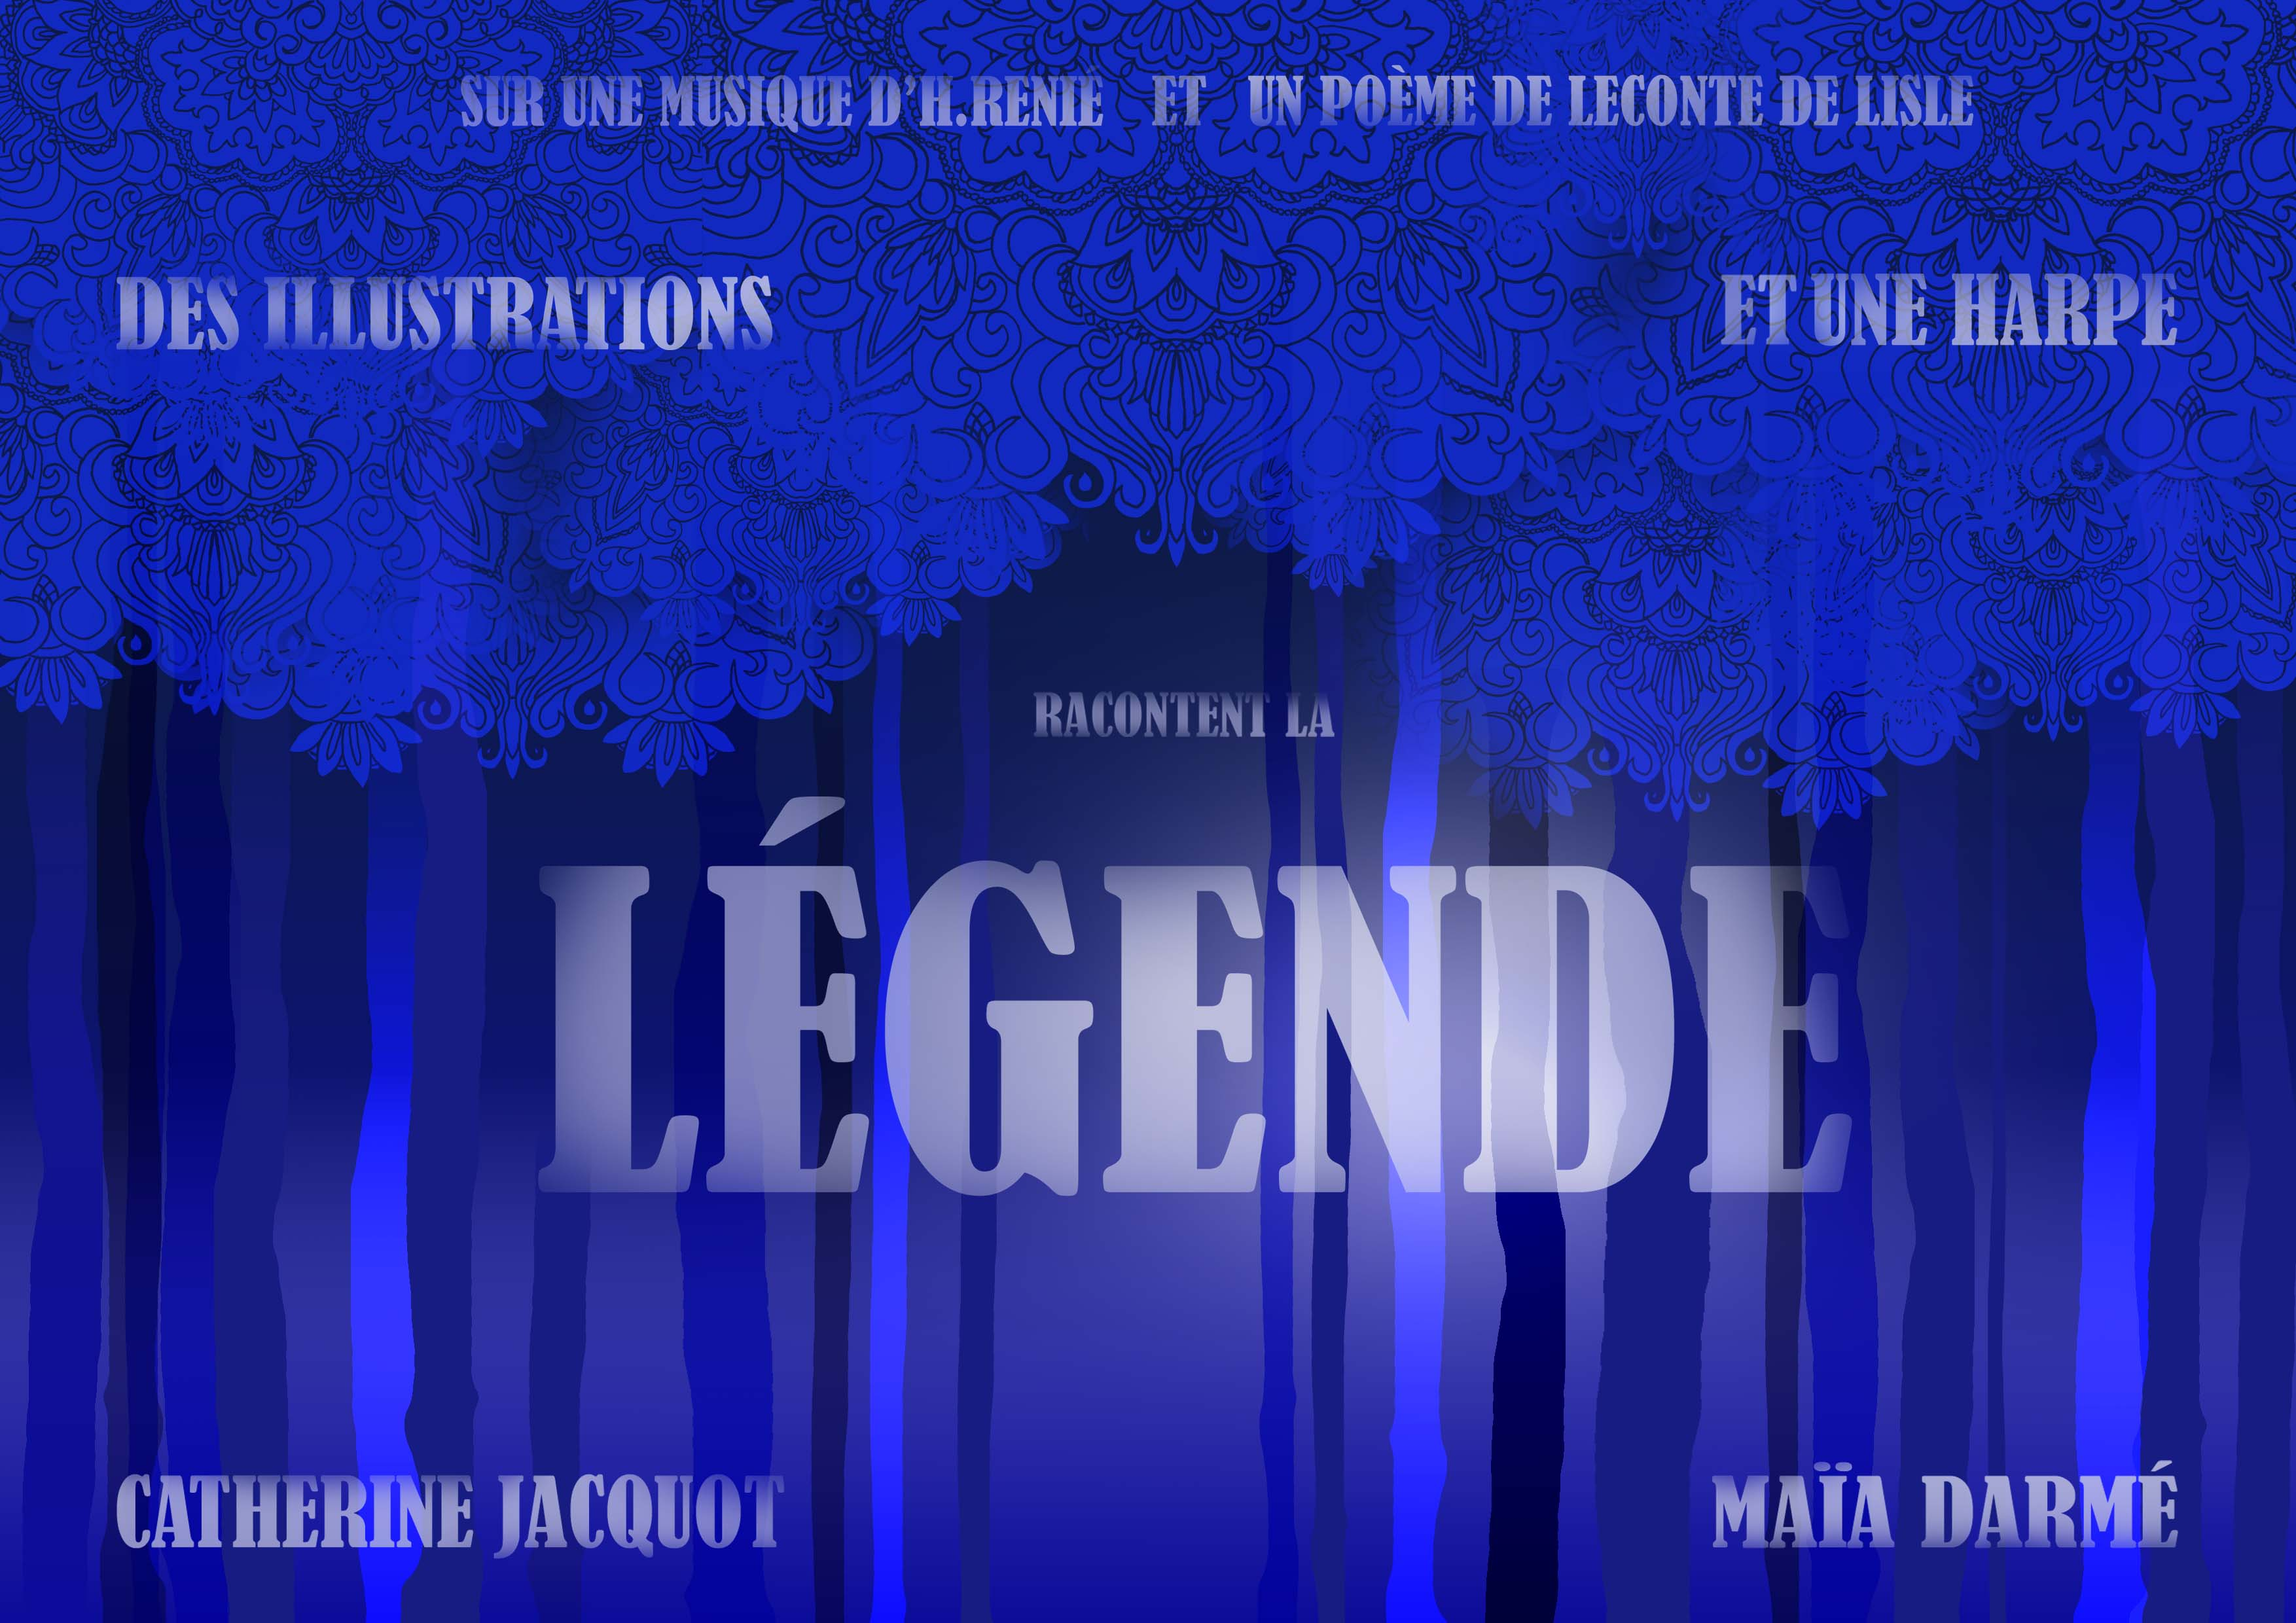 Announcing the Légende